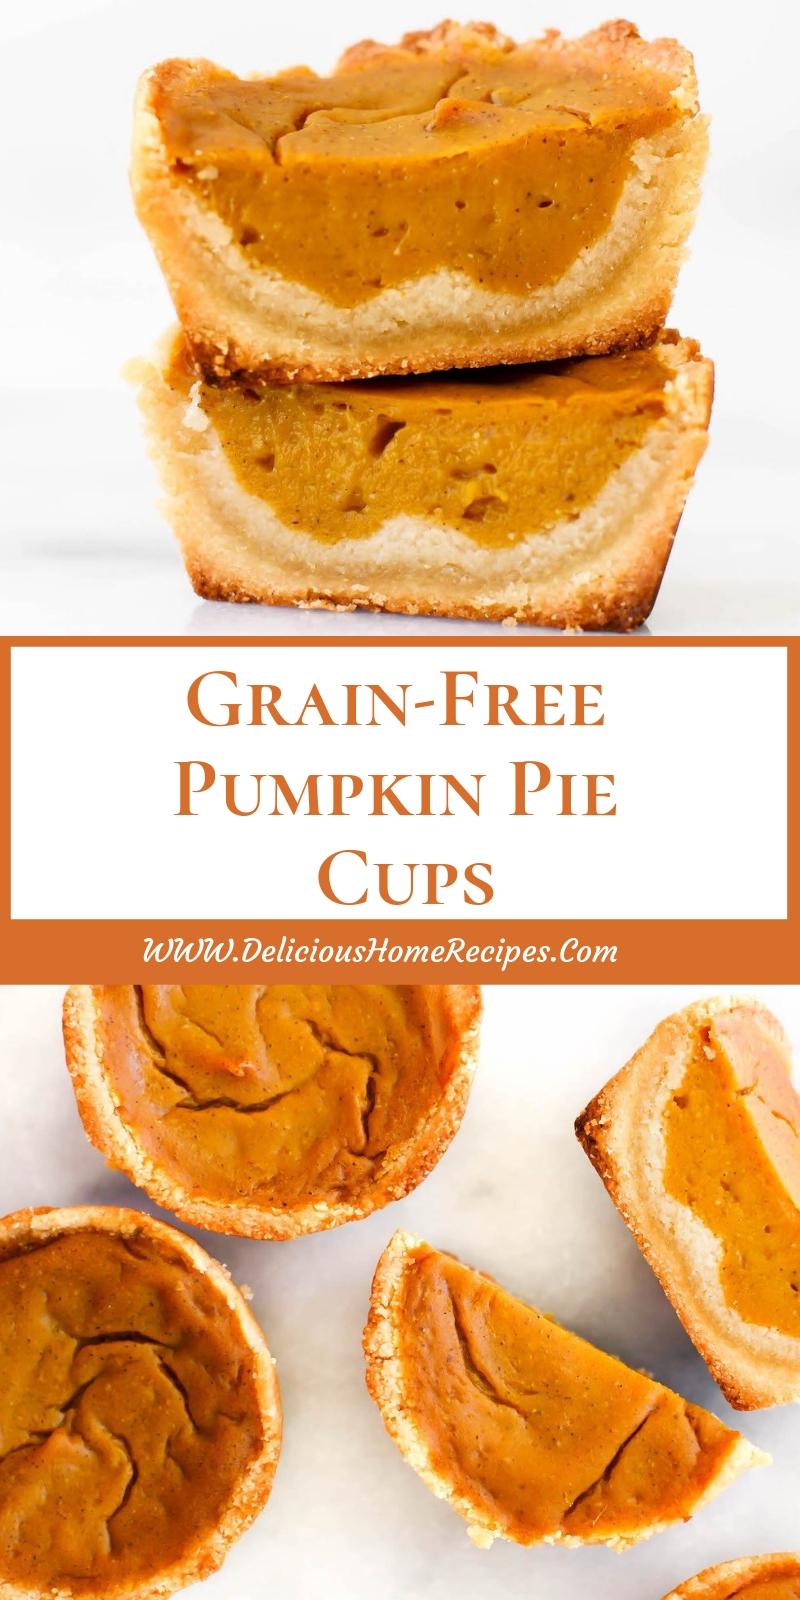 Grain-Free Pumpkin Pie Cups